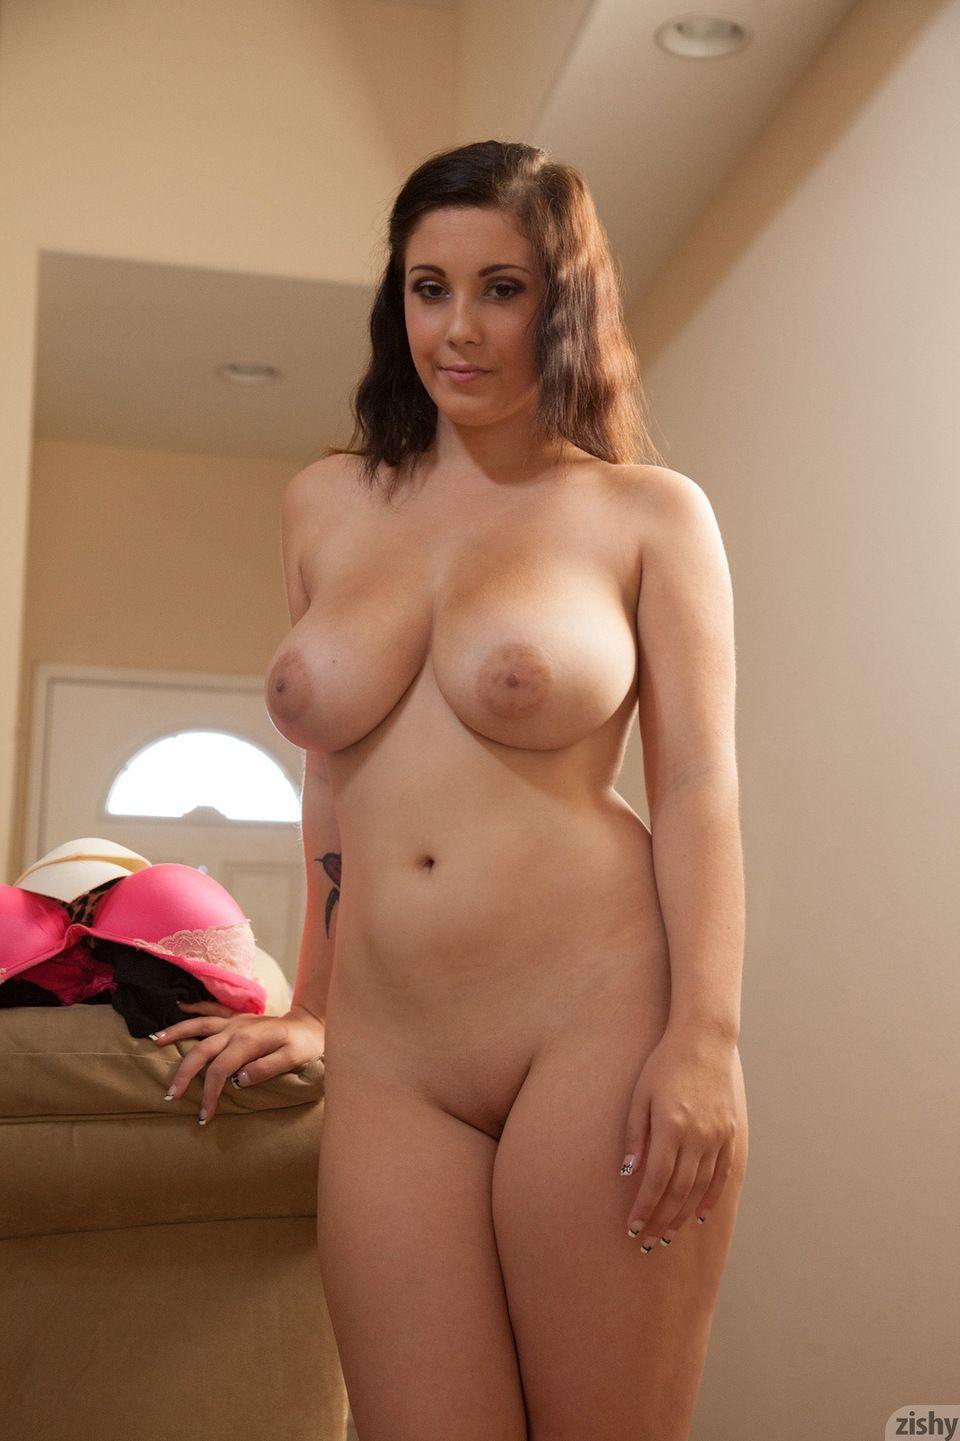 Curvy naked women sexy Curvy Hot